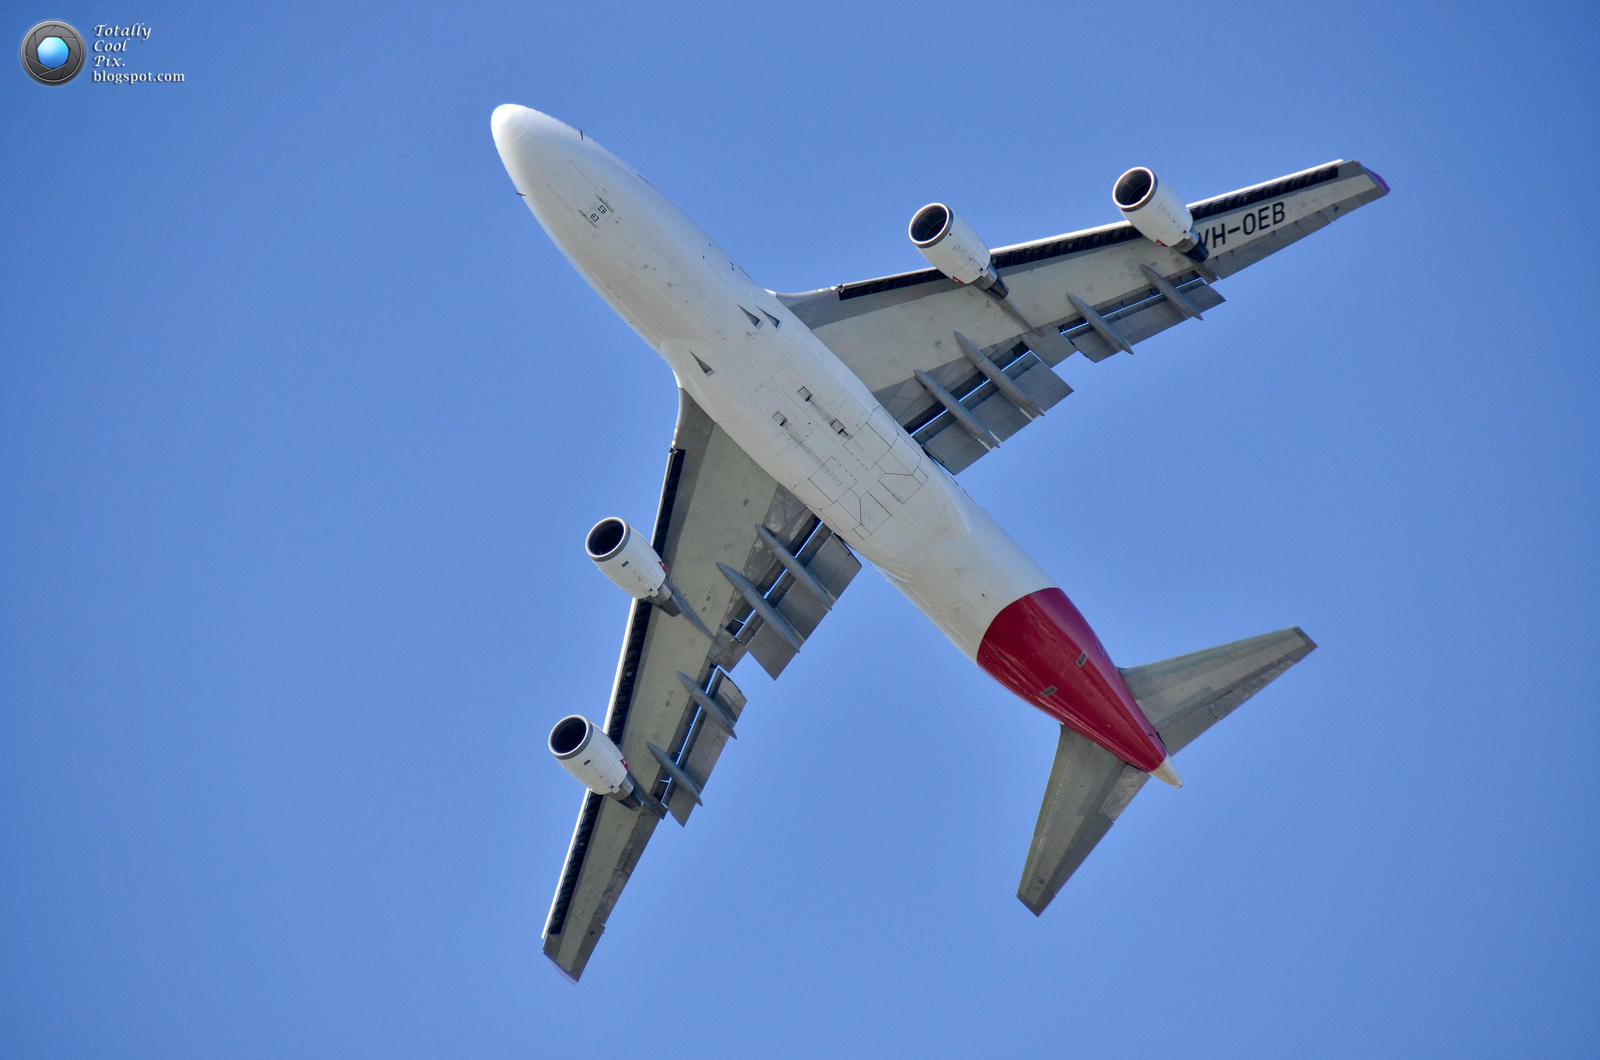 http://1.bp.blogspot.com/--vAhrwVmntI/T9xWhkyS8cI/AAAAAAAABVQ/KcTWAseEr0w/s1600/26-Australia-2012-F1-Grand-Prix-Airshow-Wallpaper-Keith-McInnes-Photography-QANTAS-747-turn.jpg